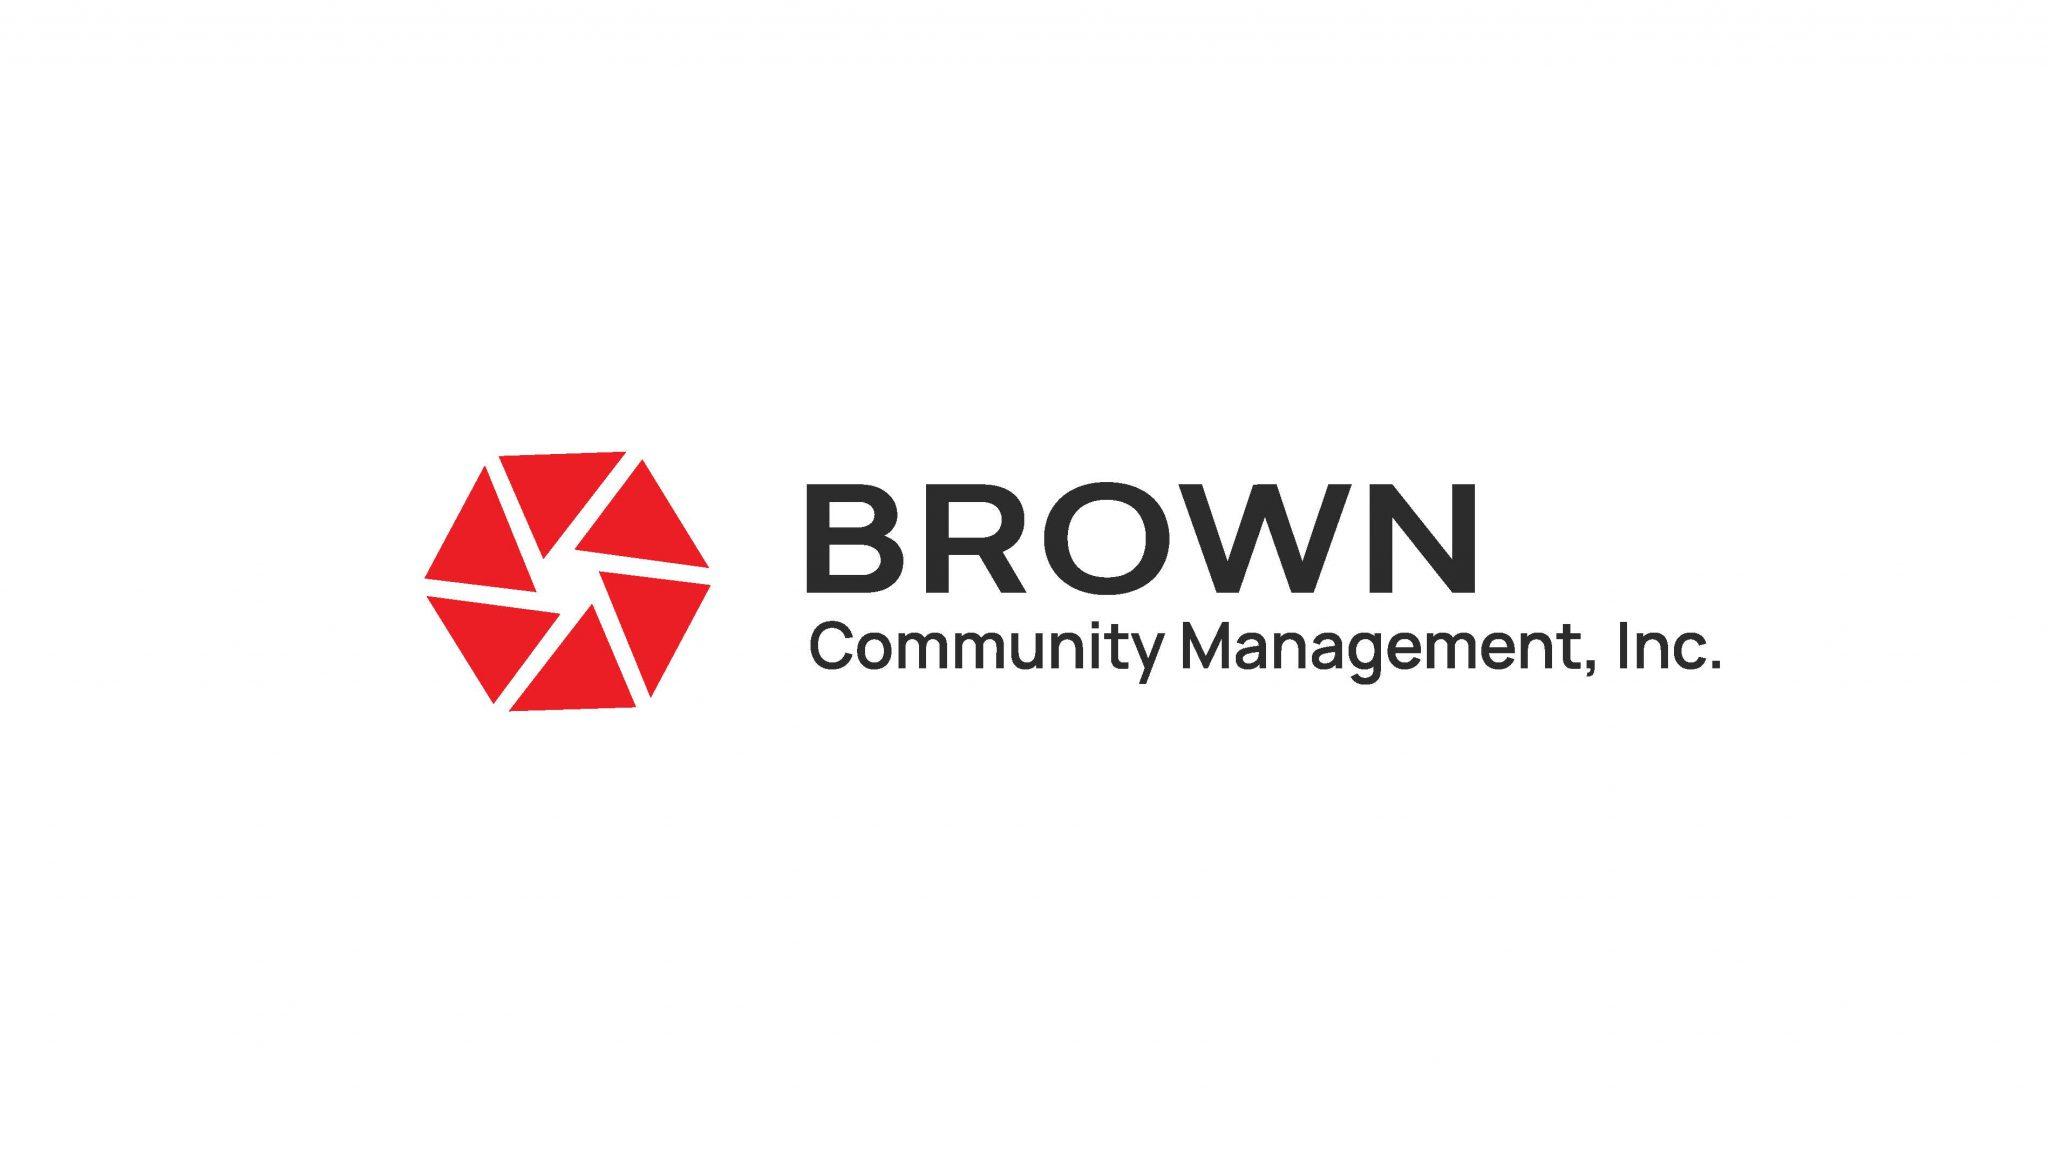 Brown Community Management, Inc.